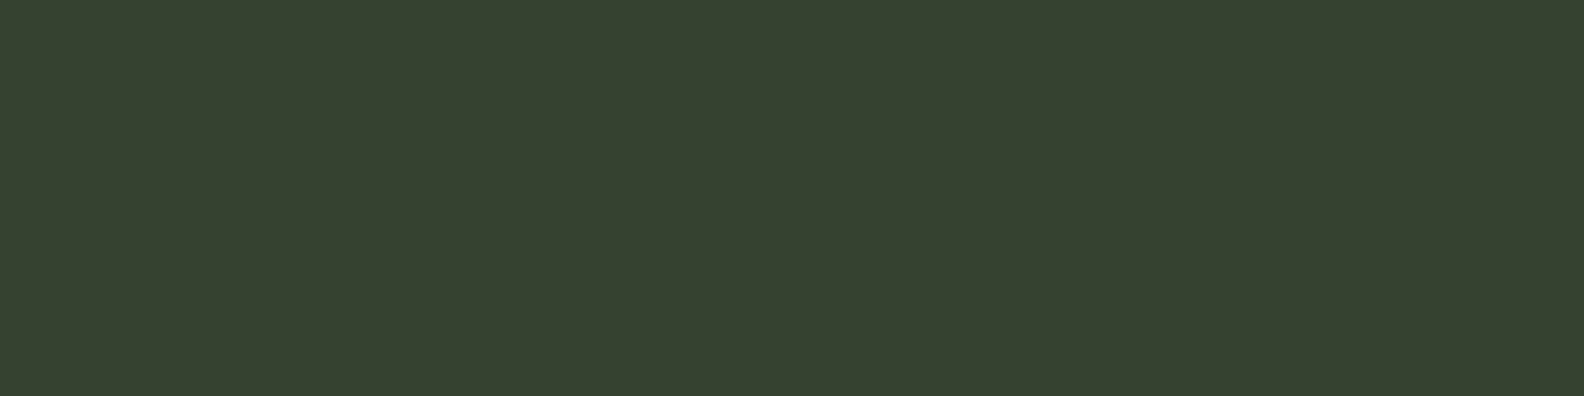 1584x396 Kombu Green Solid Color Background